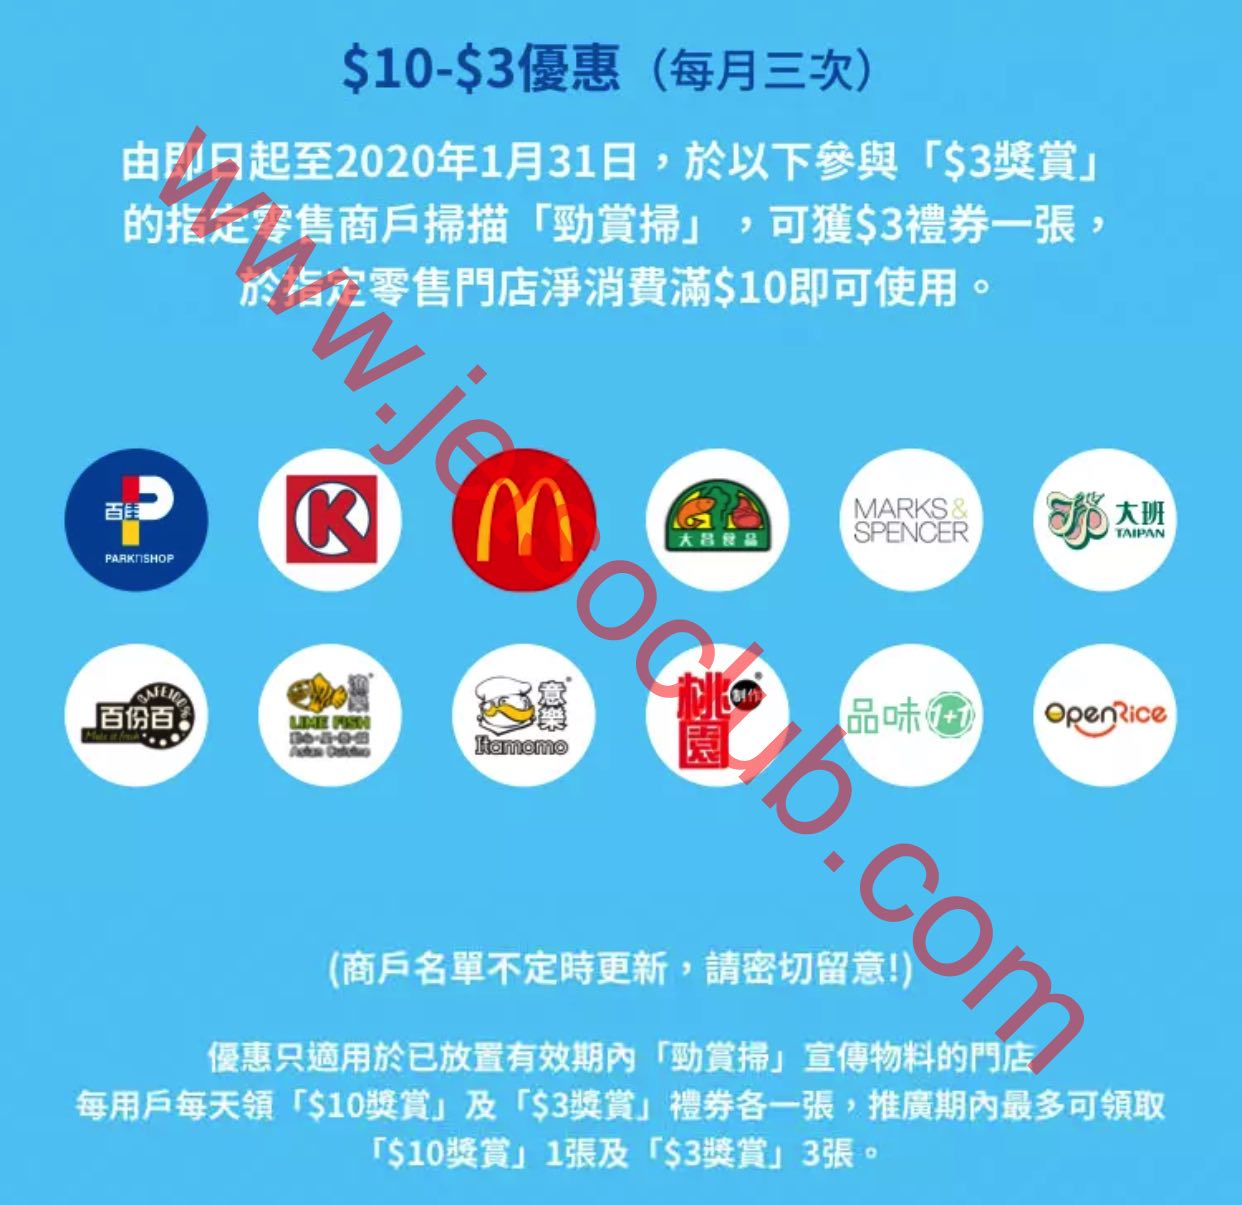 Alipay HK:1月印花獎賞 / 勁賞掃 - $10/$3獎賞 ( Jetso Club 著數俱樂部 )